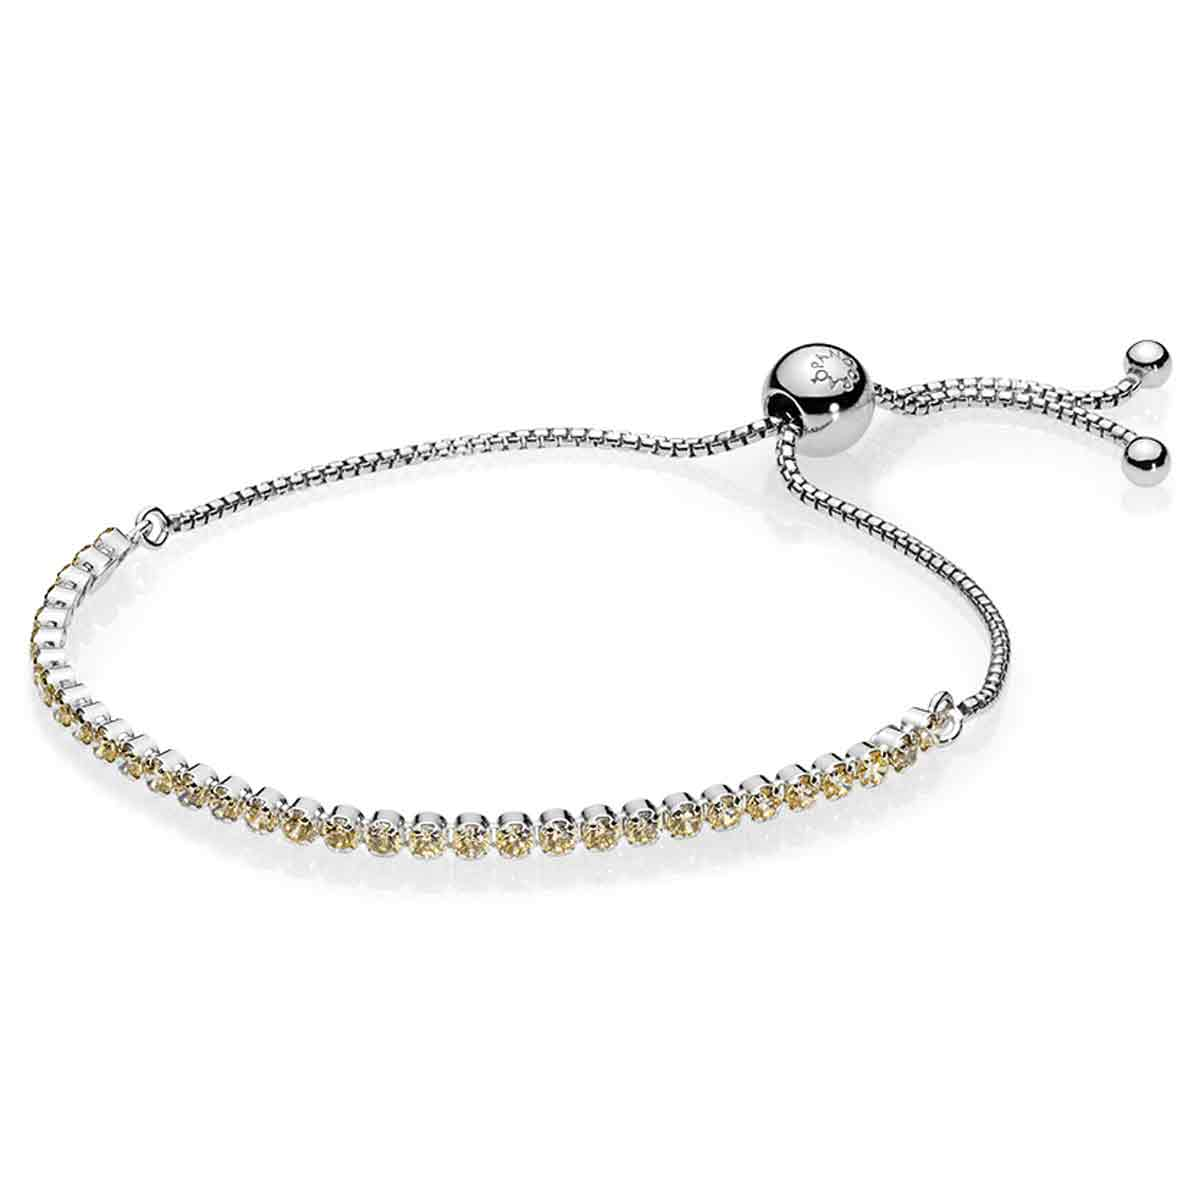 Pandora Golden Sparkling Strand Bracelet 590524ccz